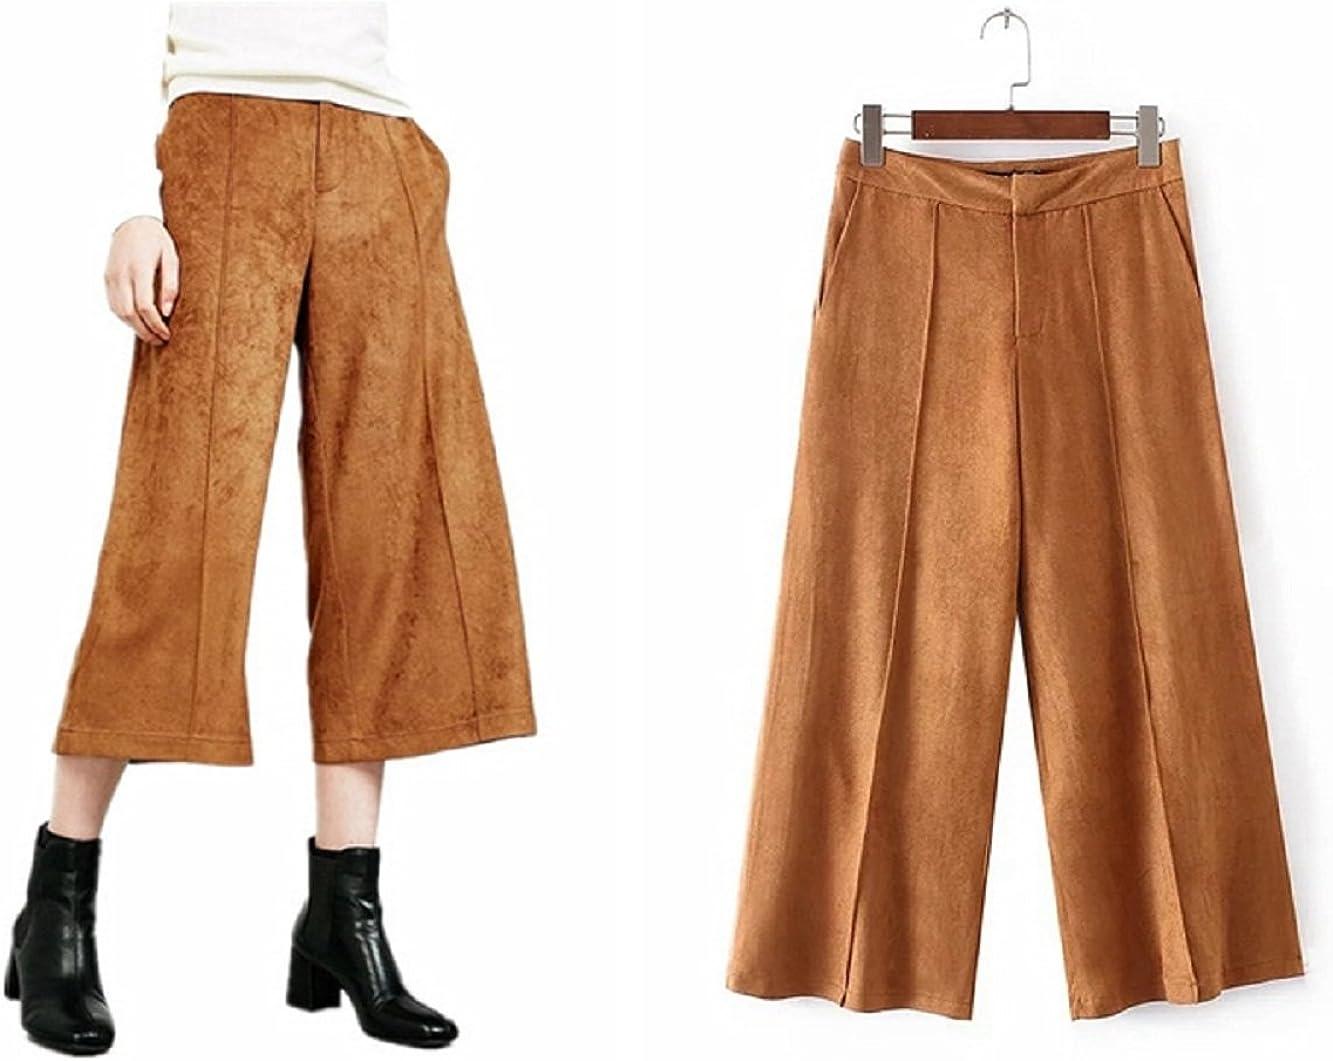 Women's New Casual Solide Faux Suede 3/4 Length Boyfriend Trousers Pants